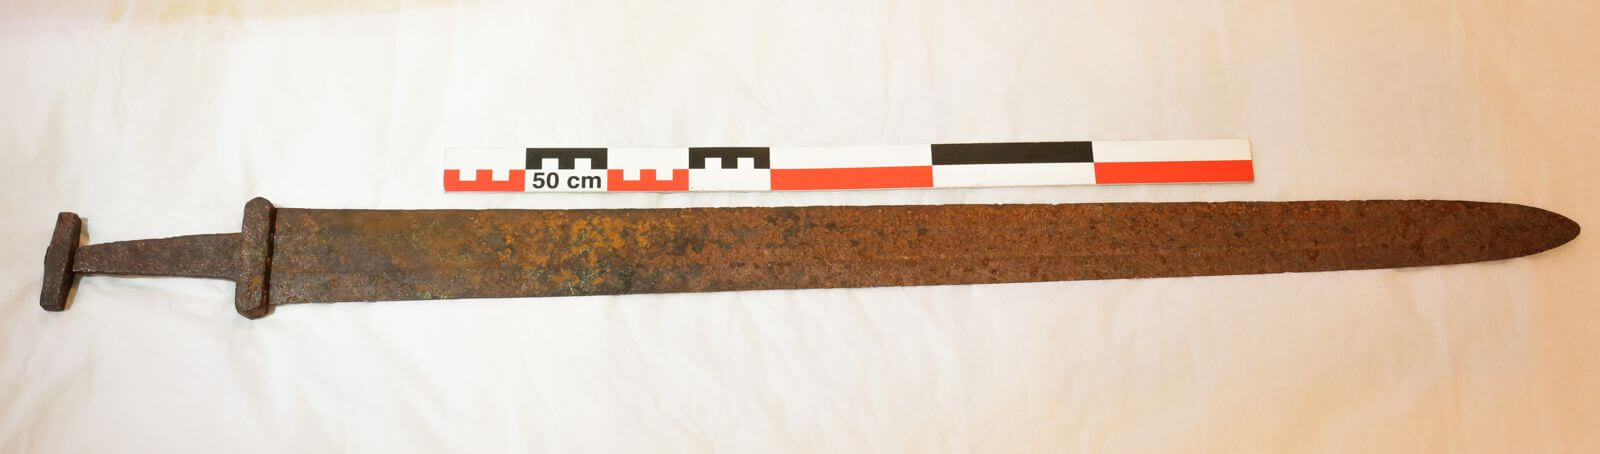 viking sword 4 (1)